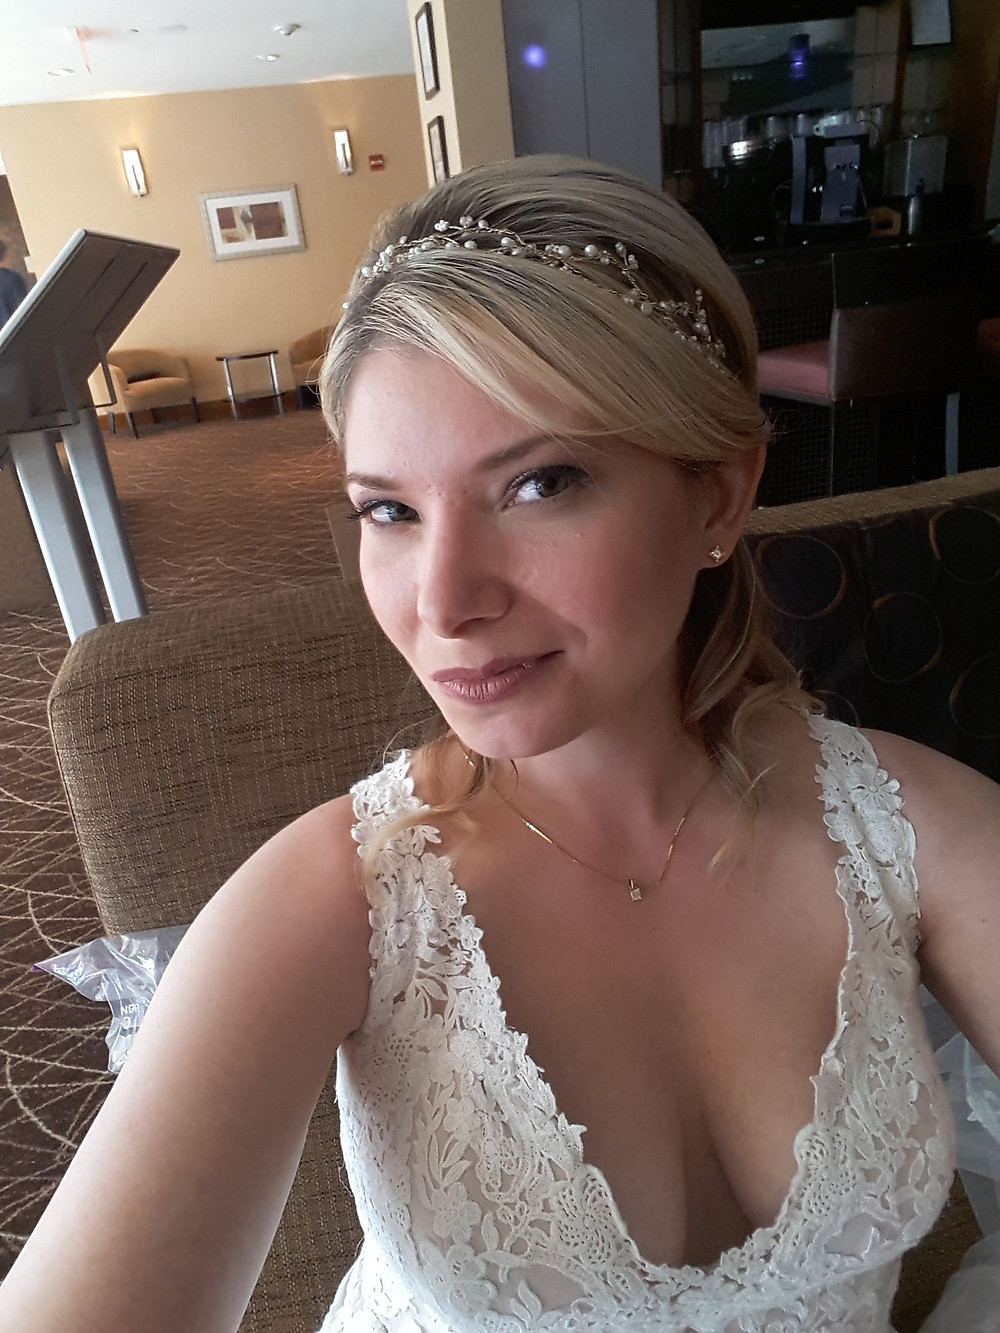 the bride is taking a selfie